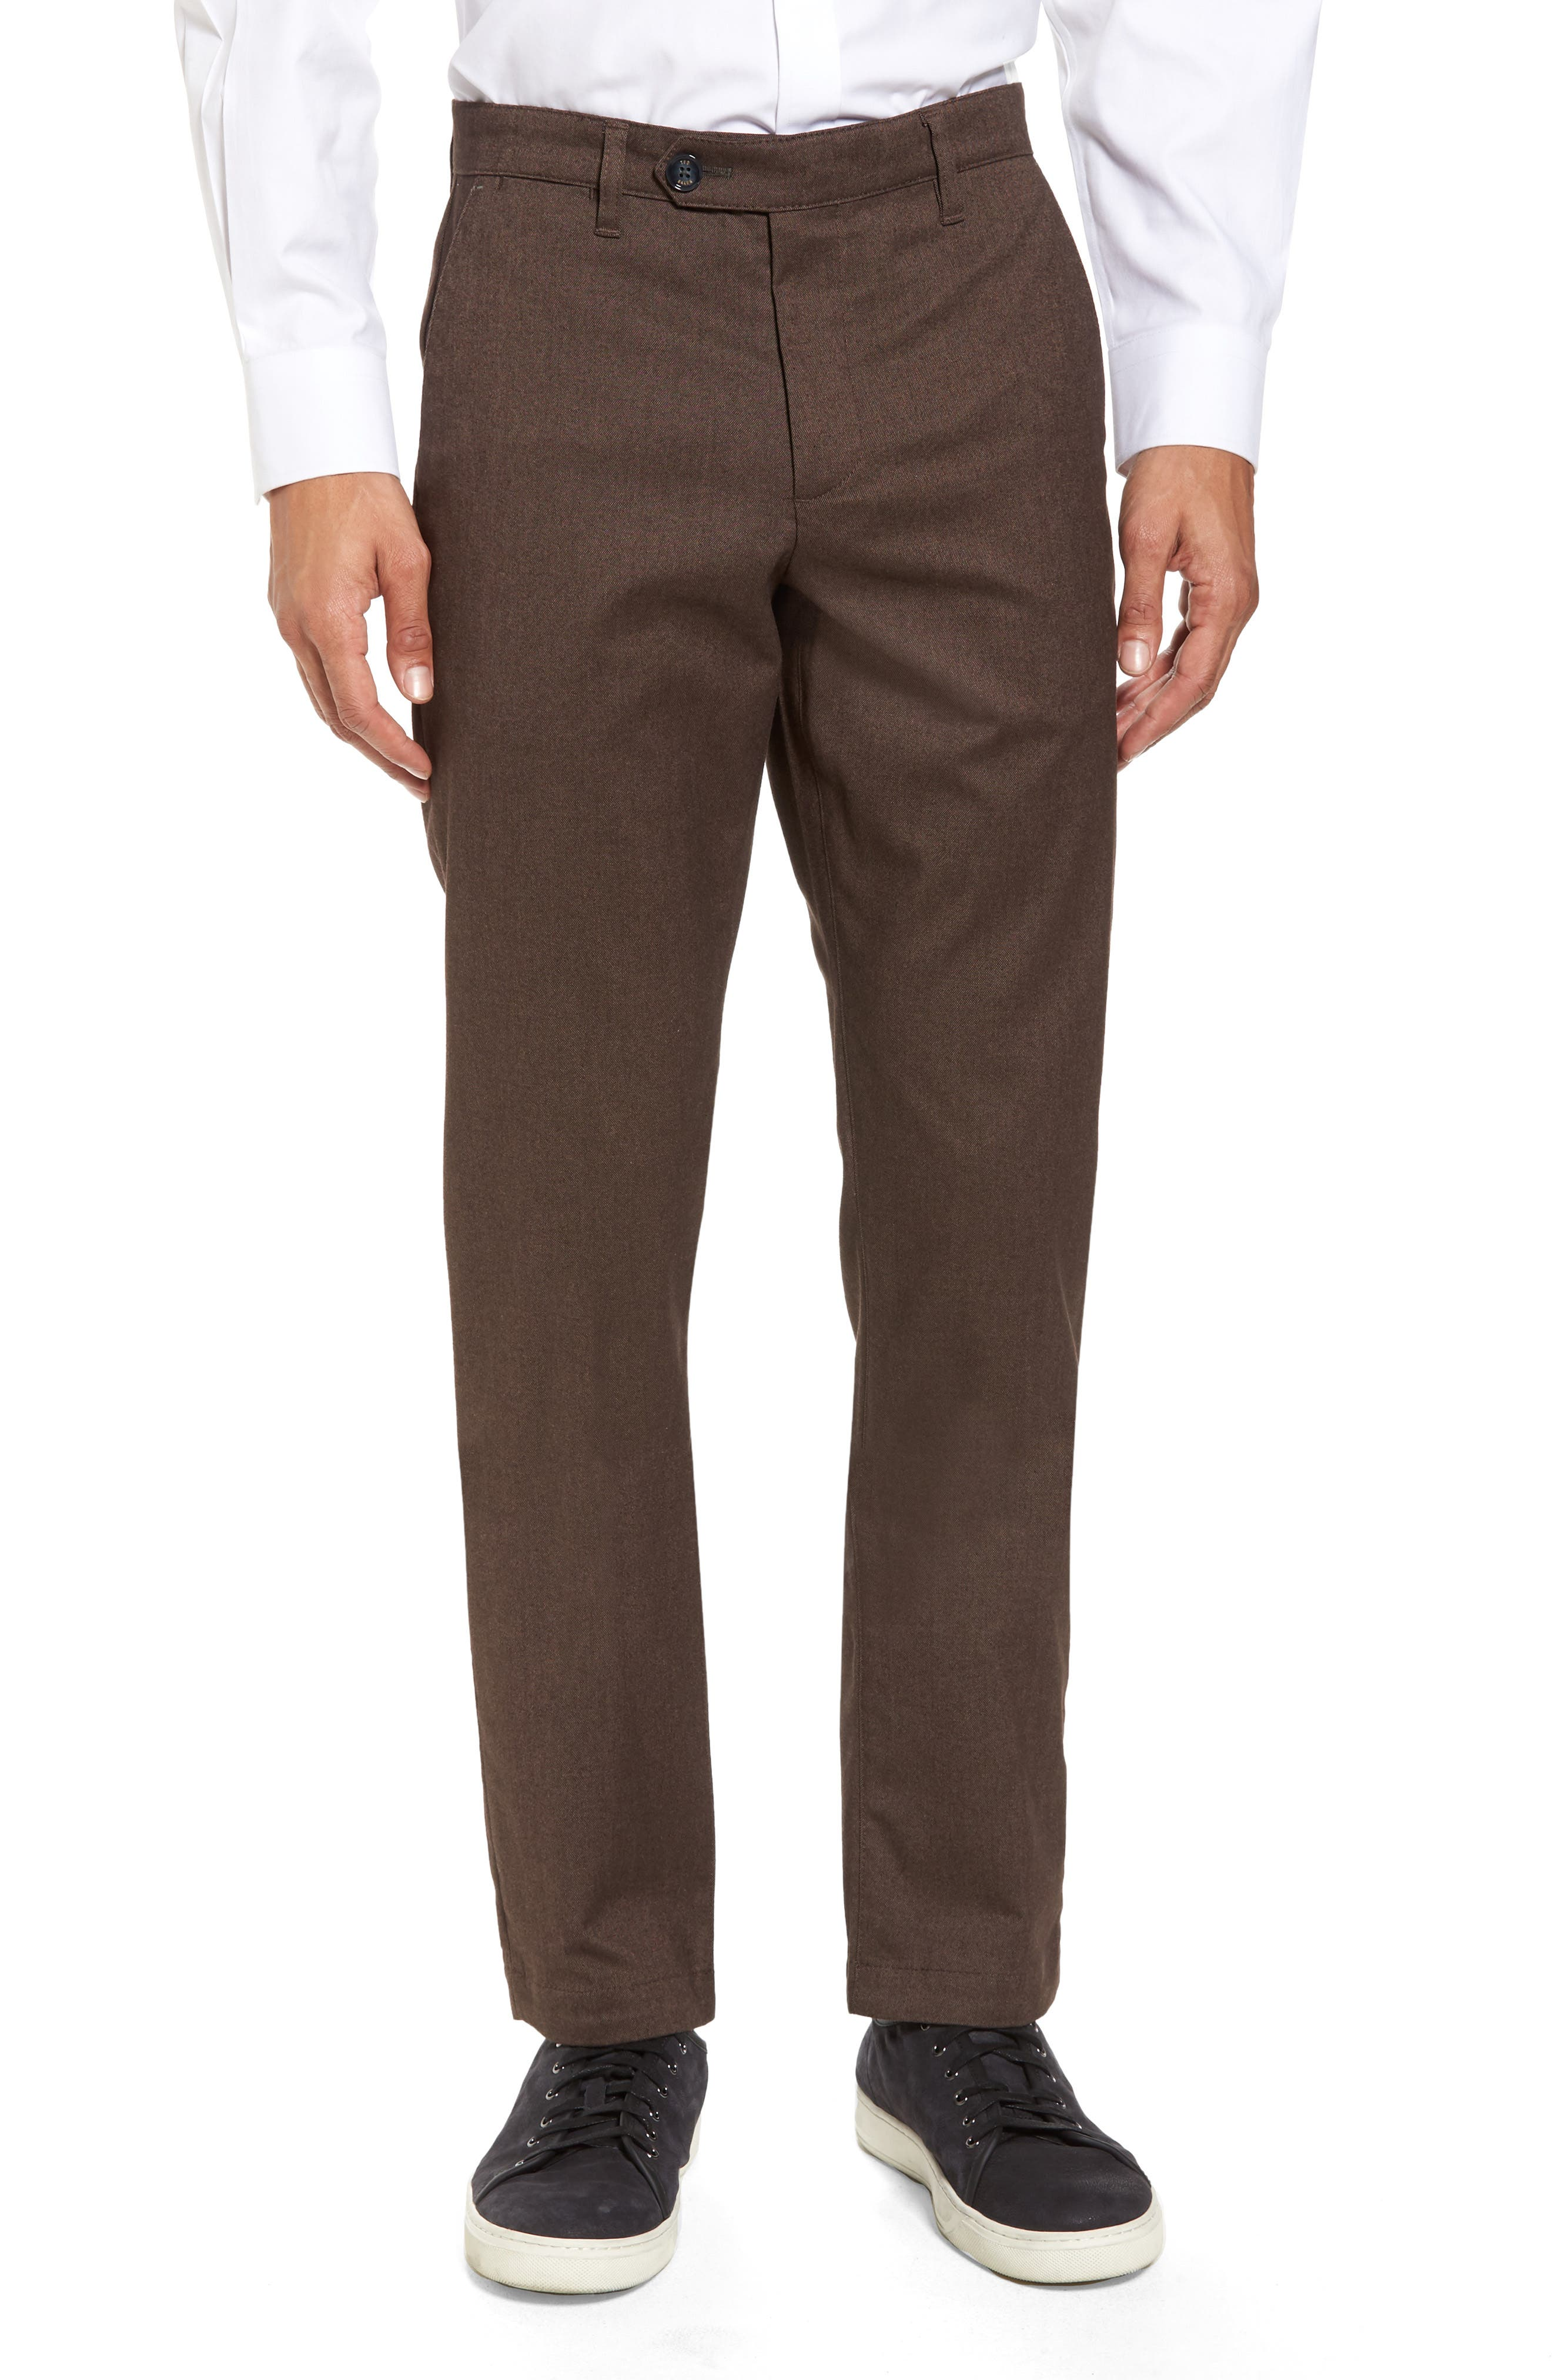 Freshman Modern Fit Brushed Pants,                         Main,                         color, Brown